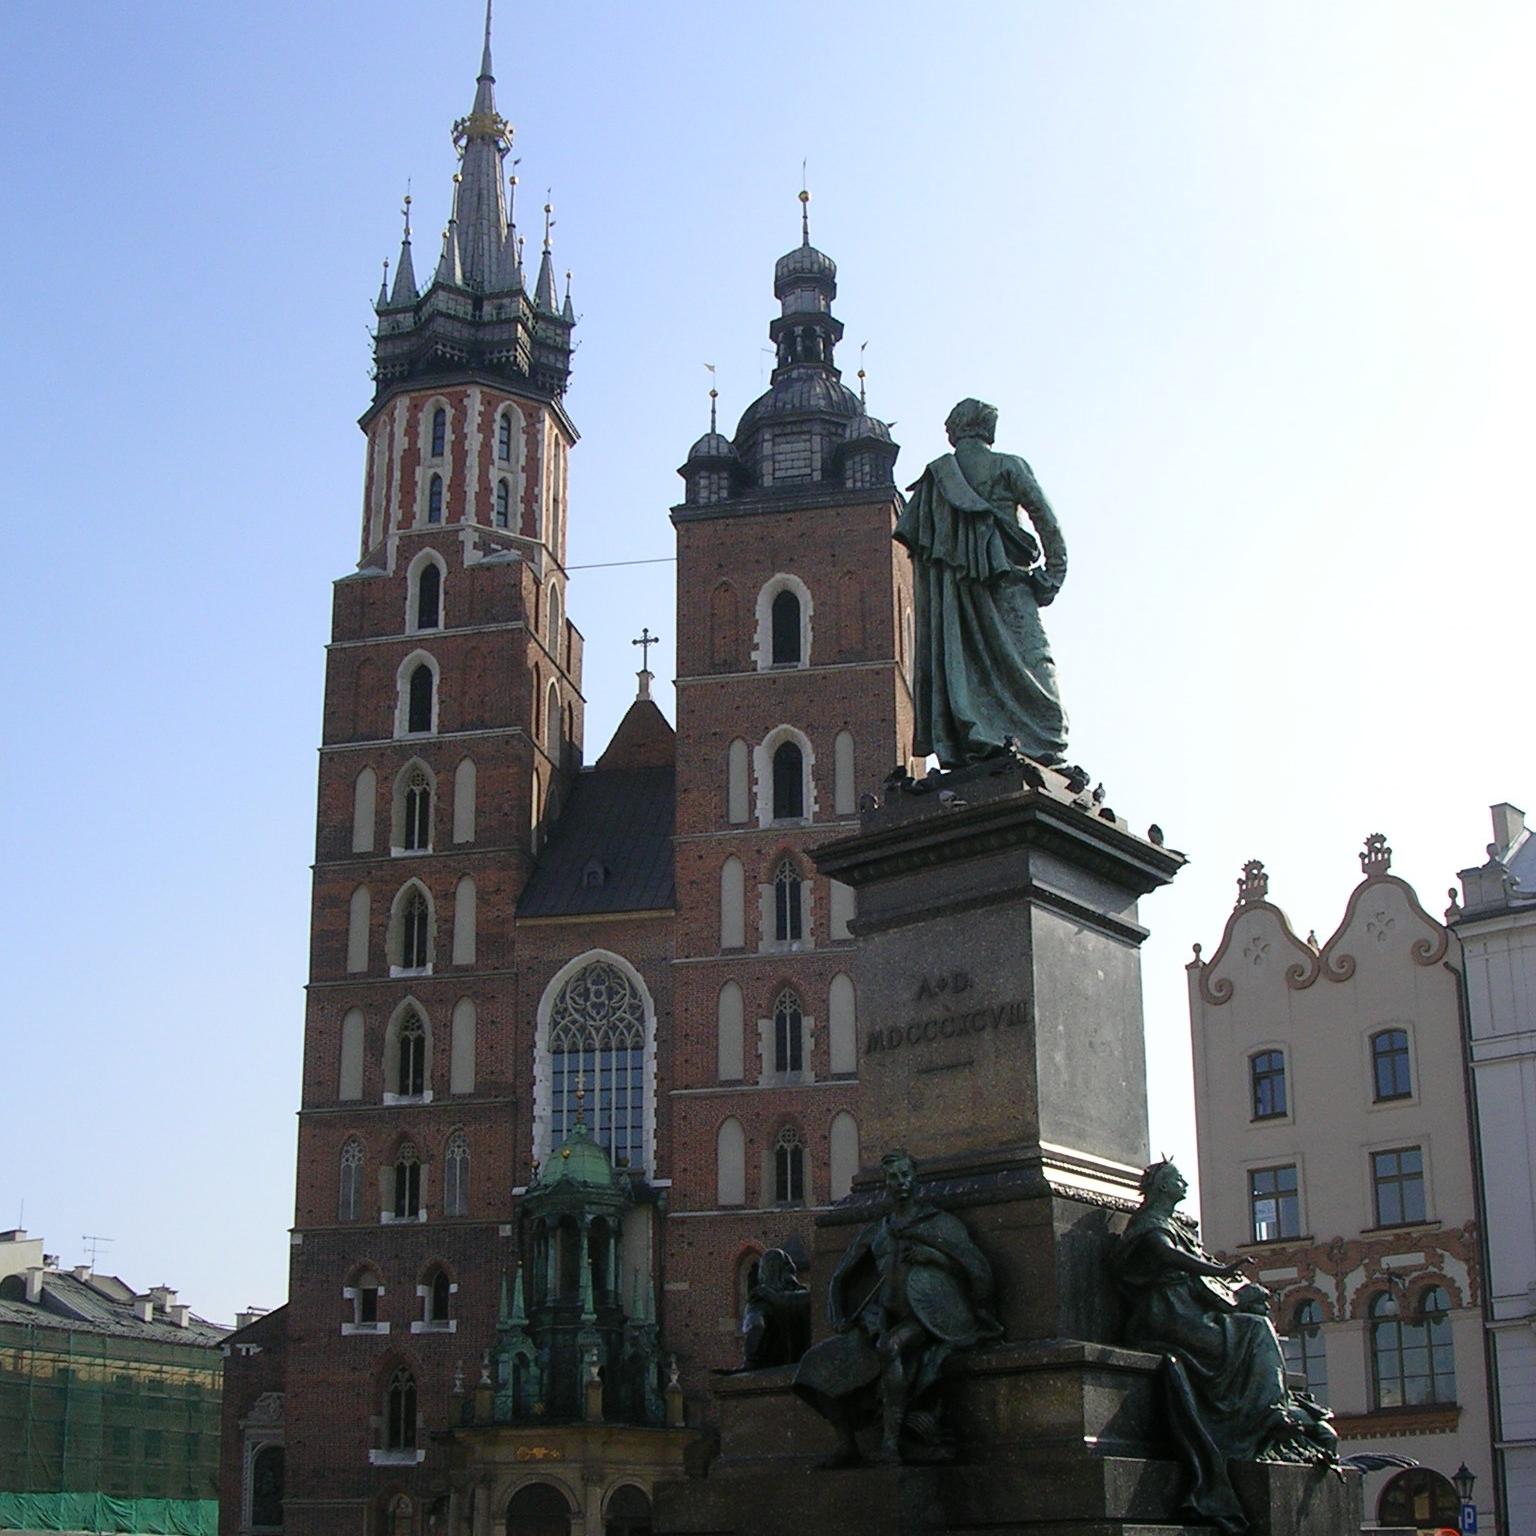 St Mary's, Krakow by The Doubtful Traveller